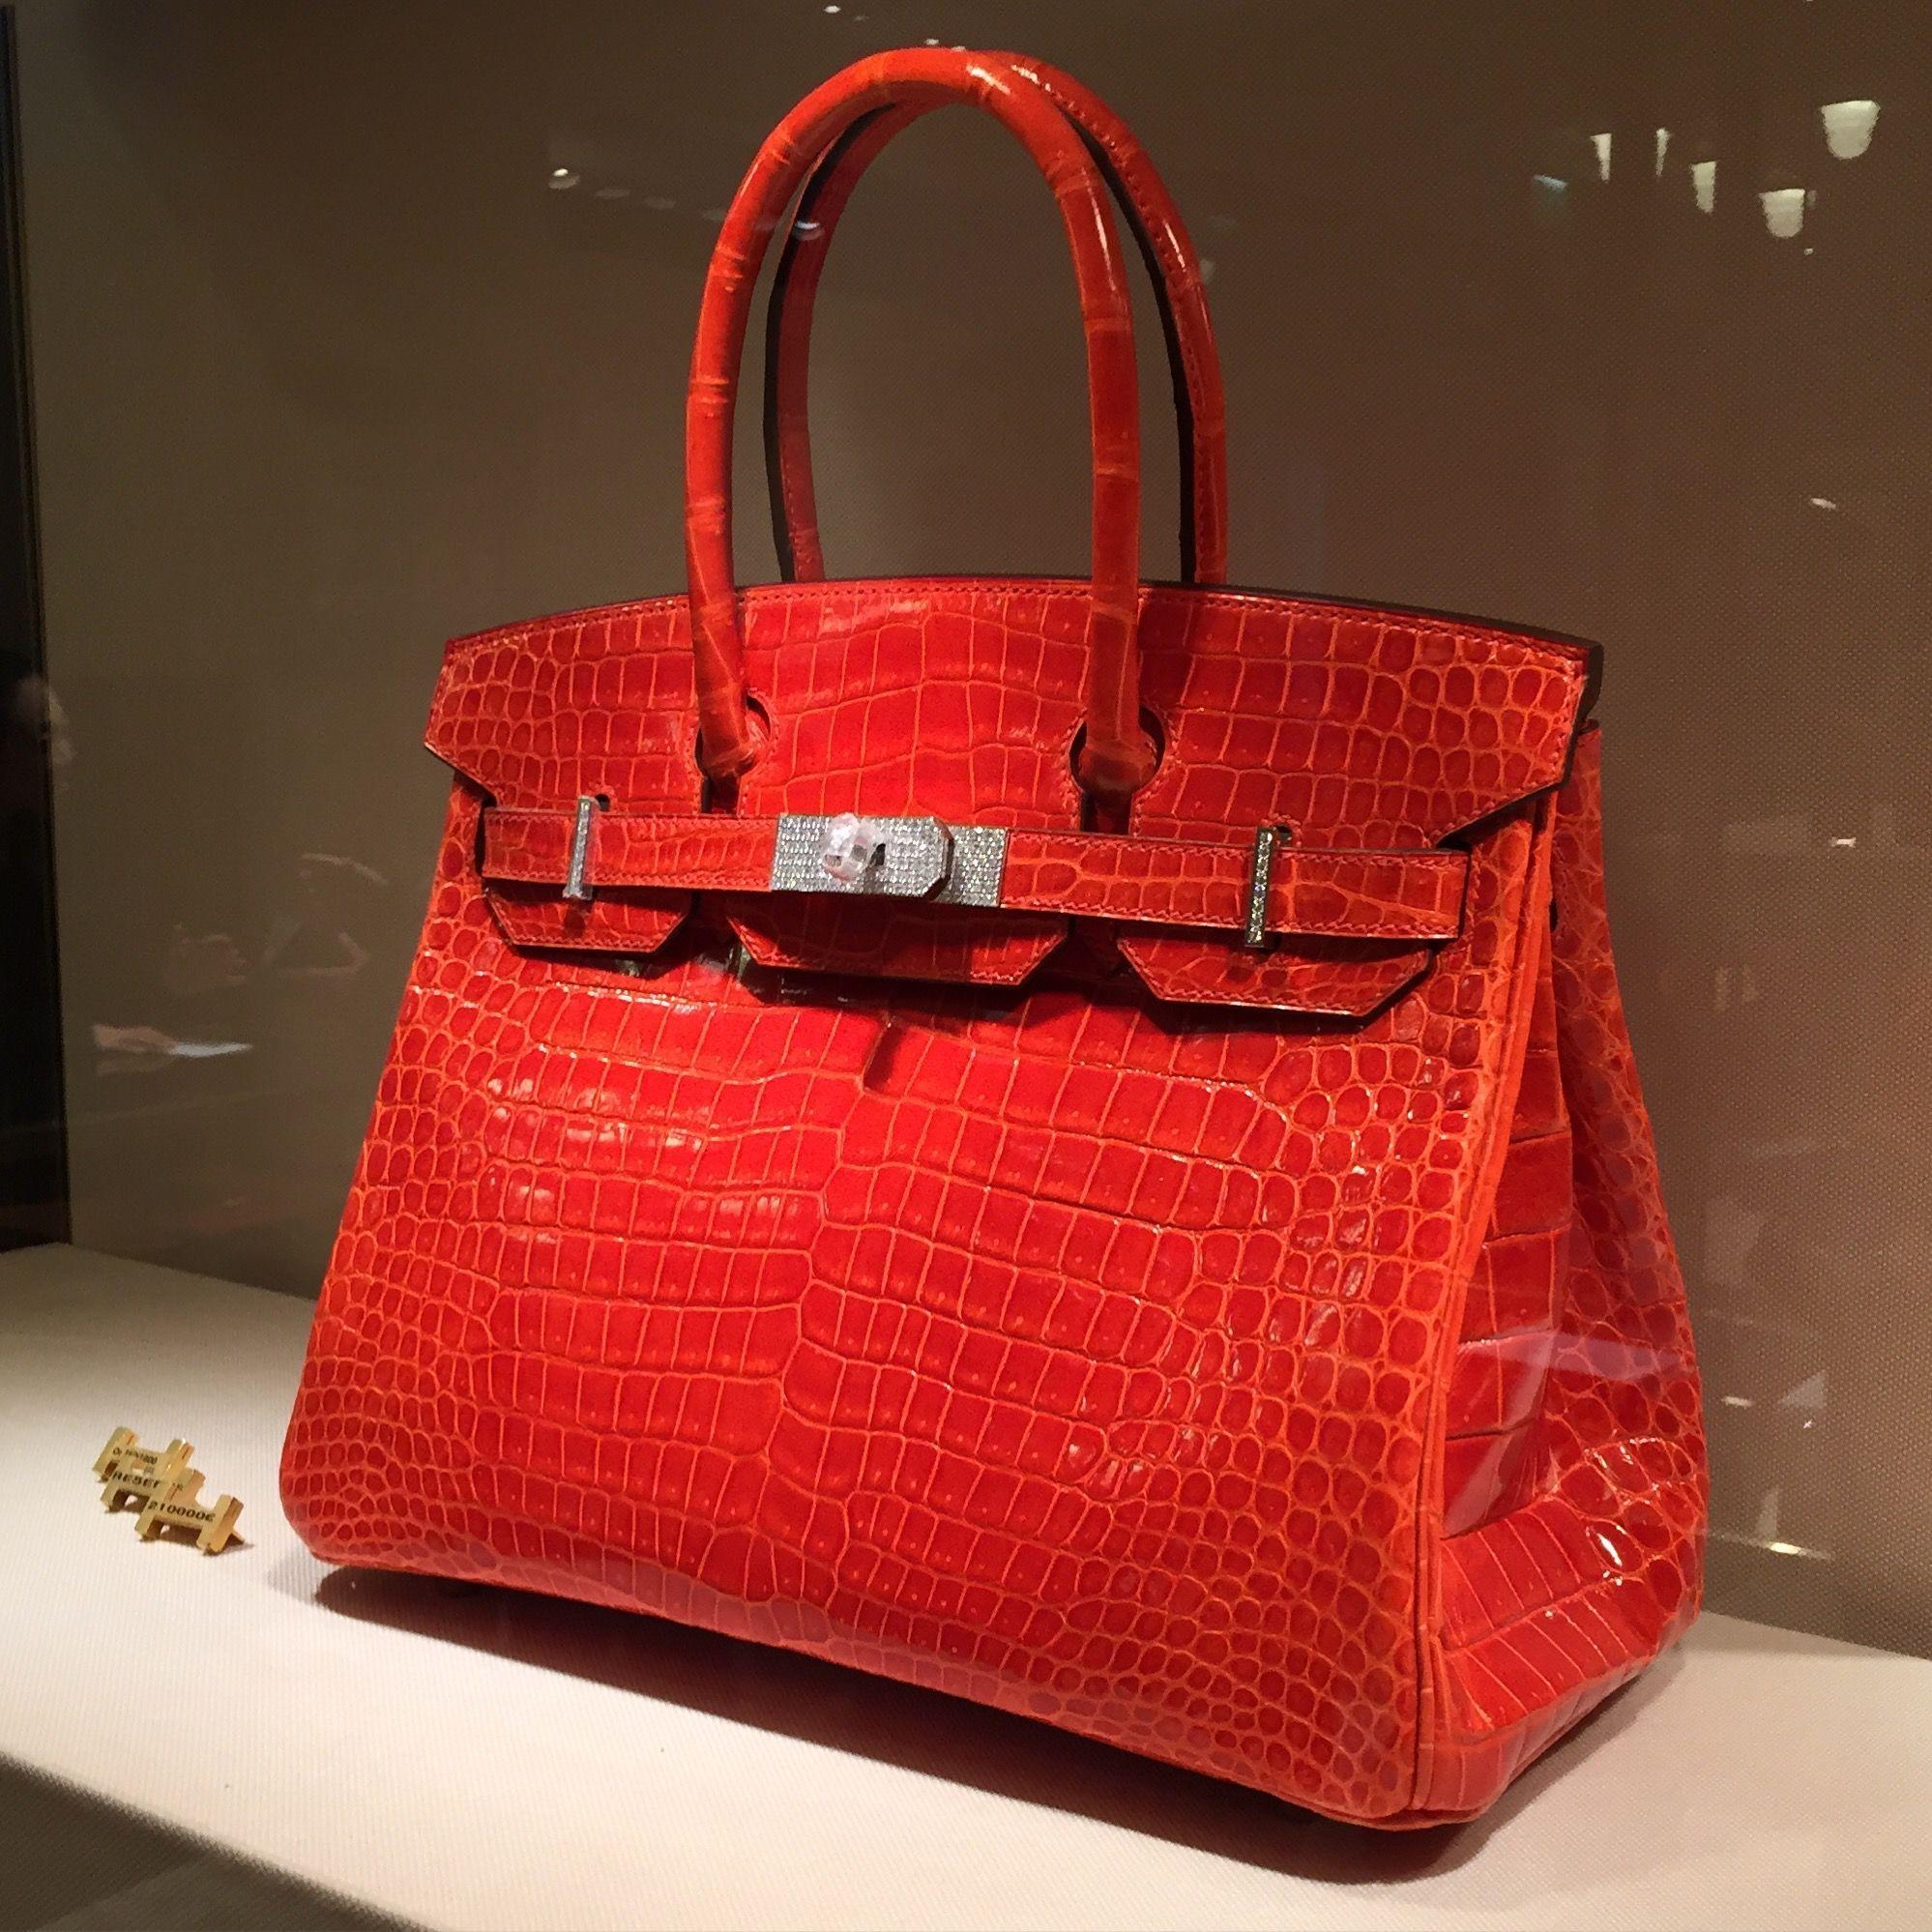 silver plum handbags - Gold, S&P 500, or Hermes Birkin? - PurseBop